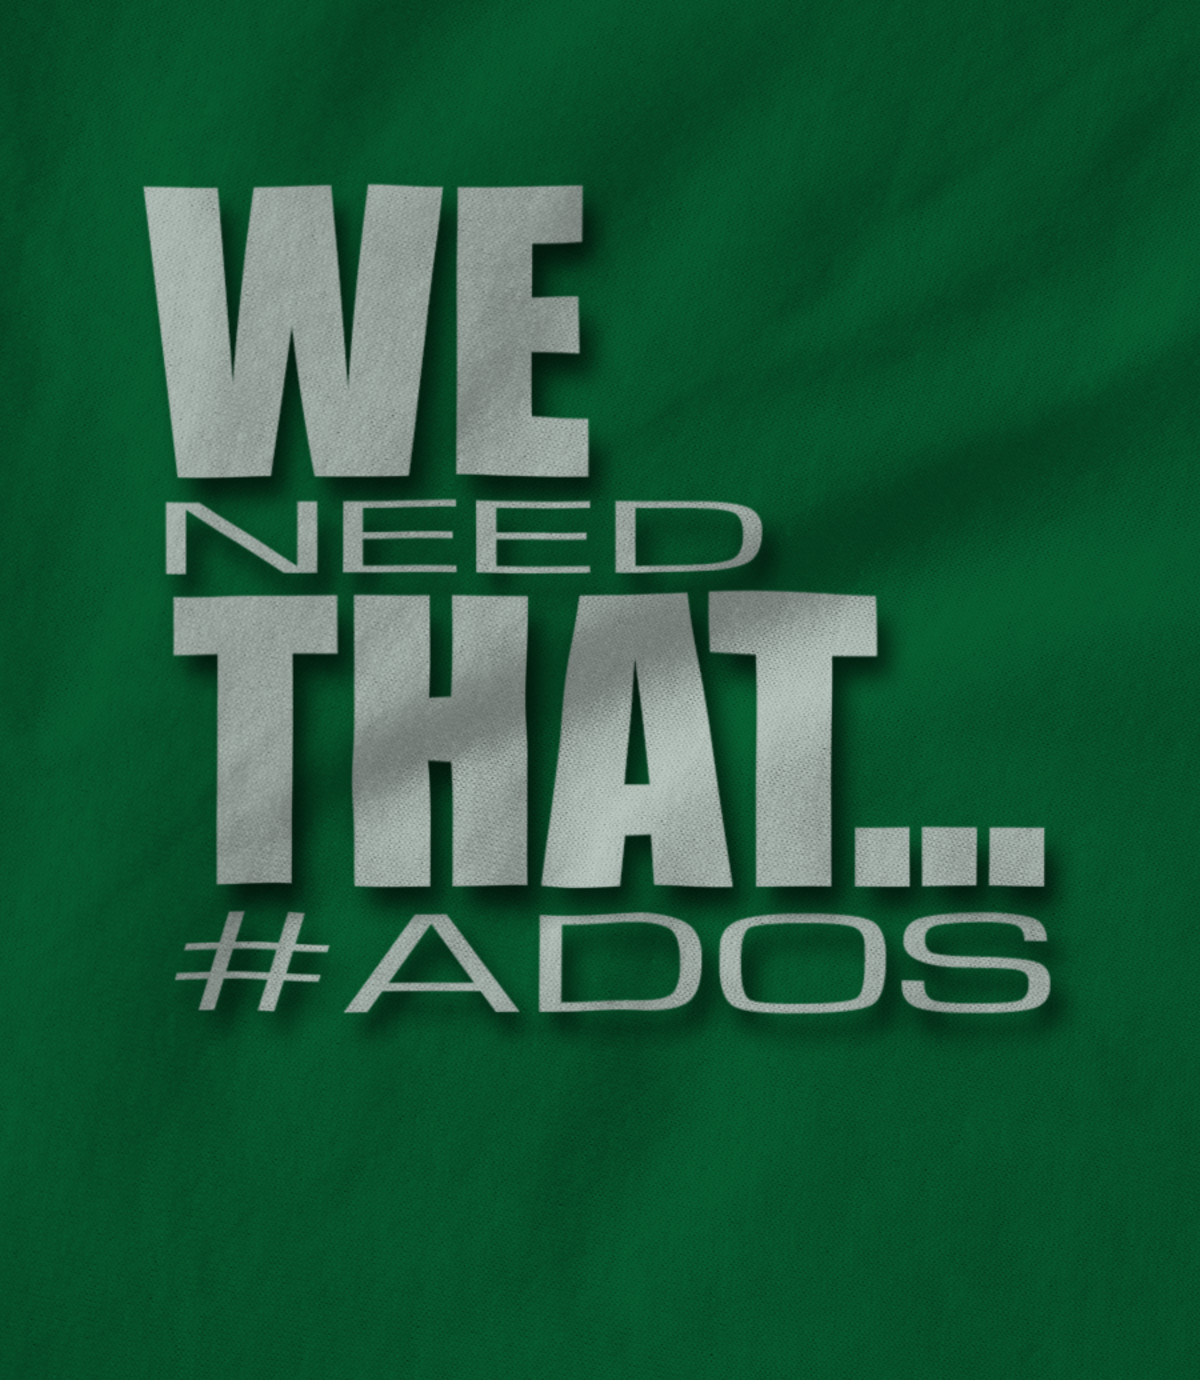 20 20 we need that     ados 1552777034